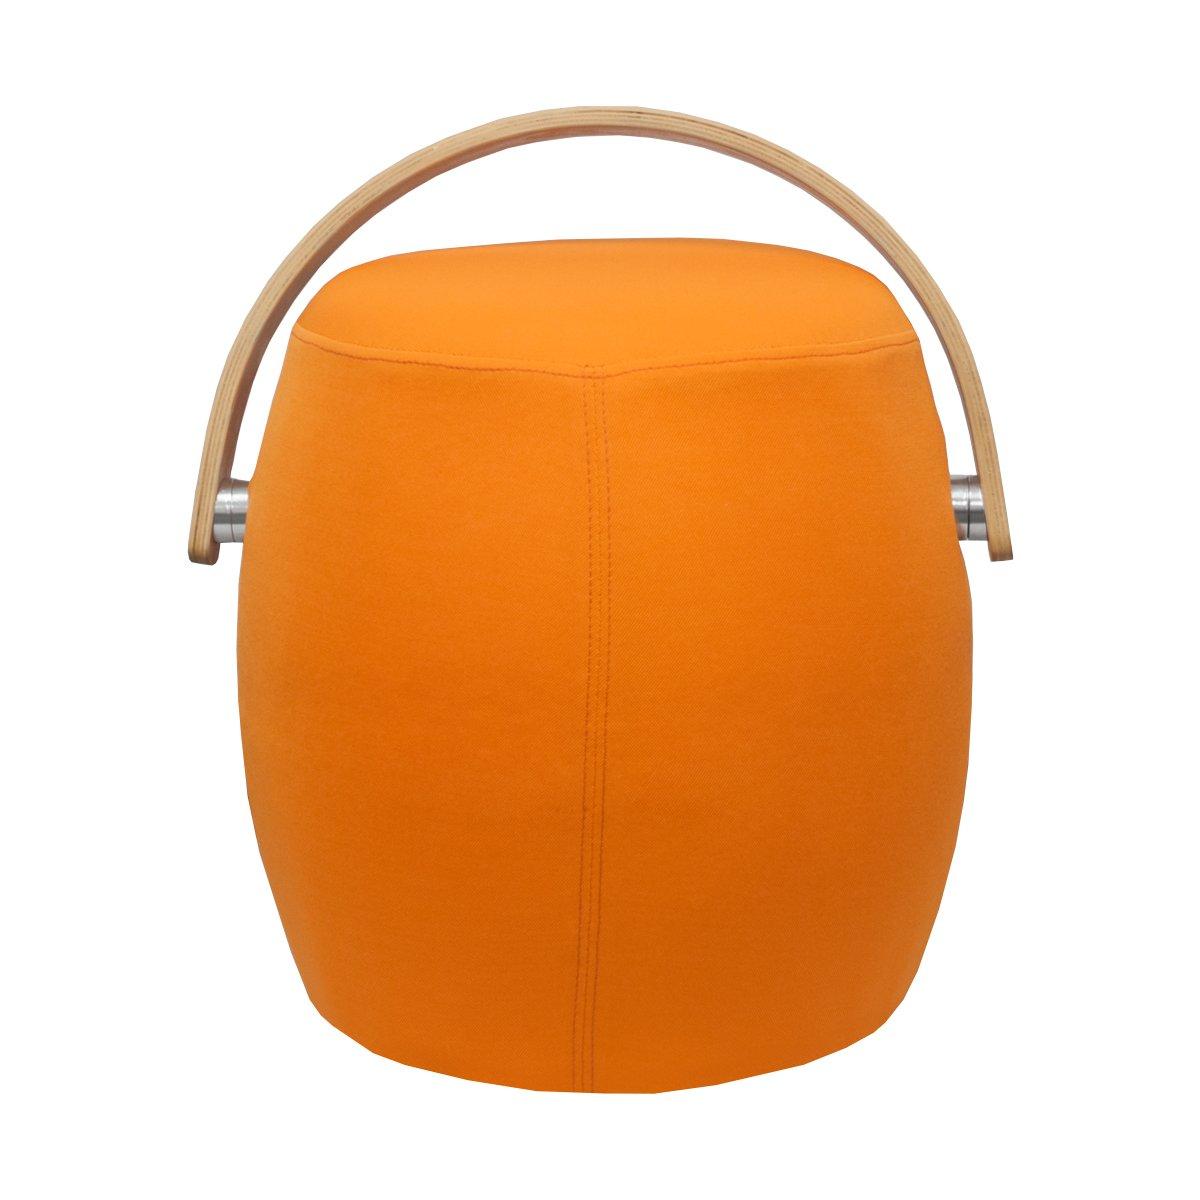 Mod Made Modern Bucket Stool Chair Ottoman with Plywood Handle, Orange